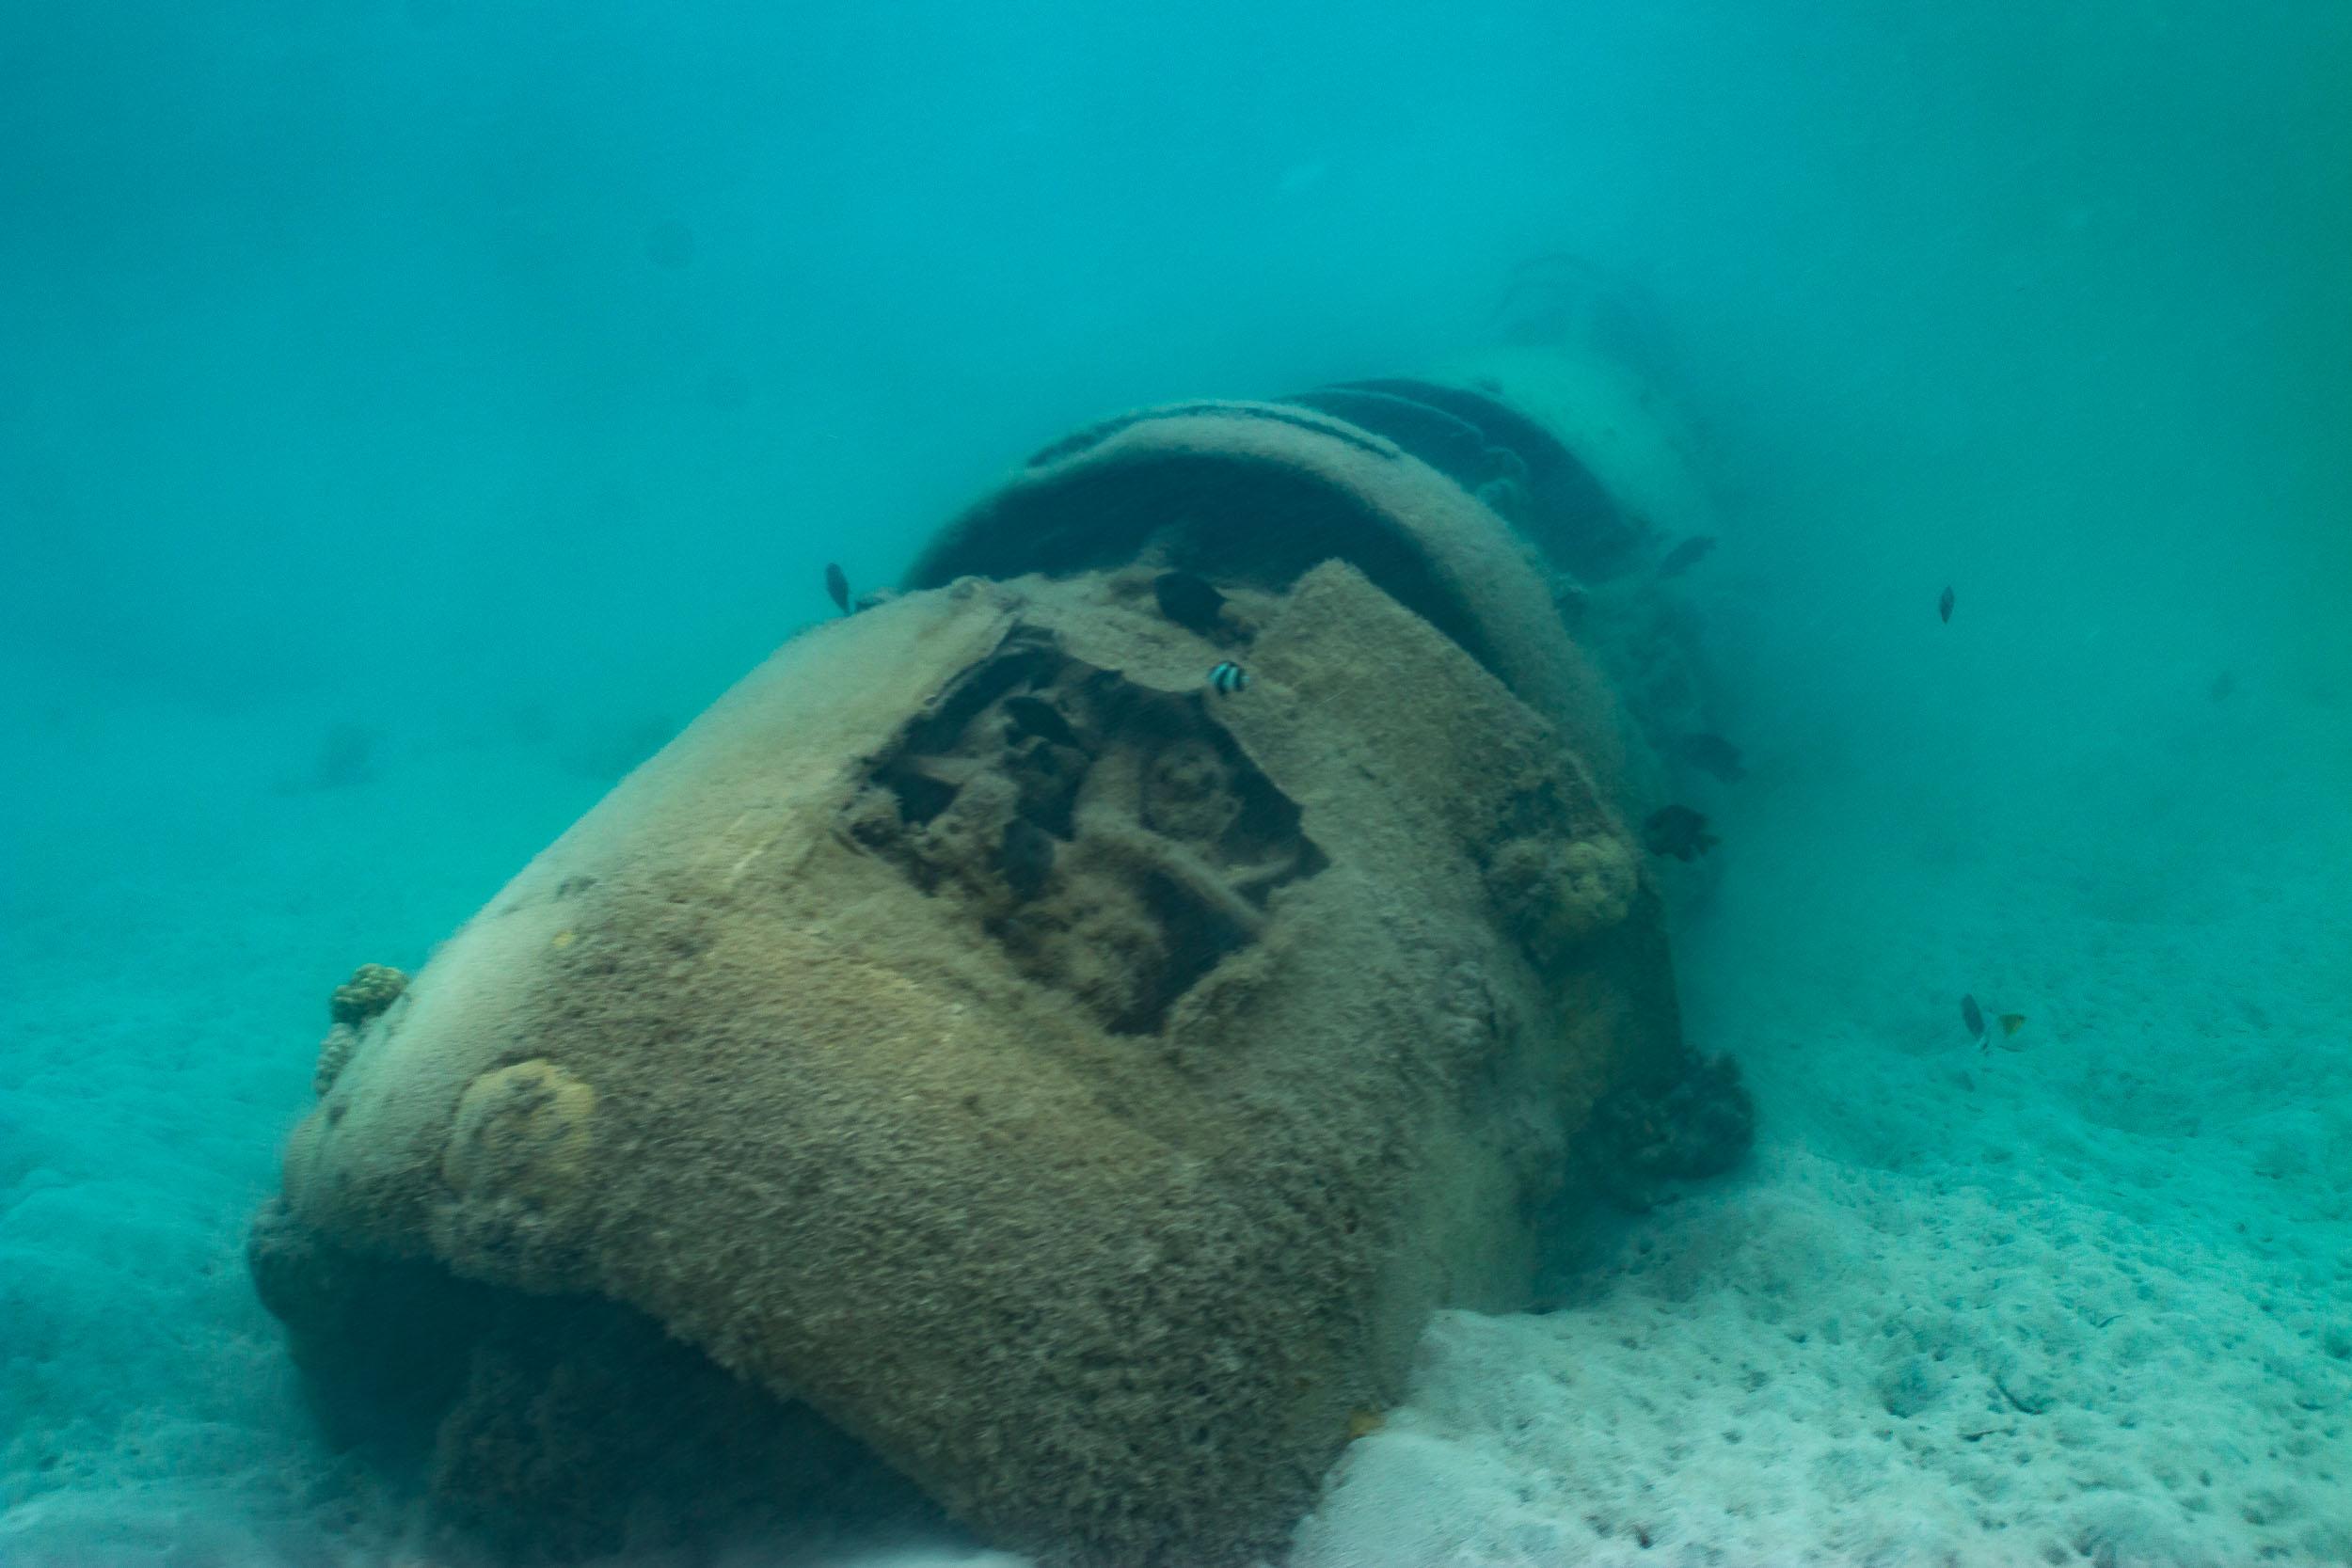 Snorkel on a World War 2 Plane Wreck, Efate, Vanuatu (Engine bay)